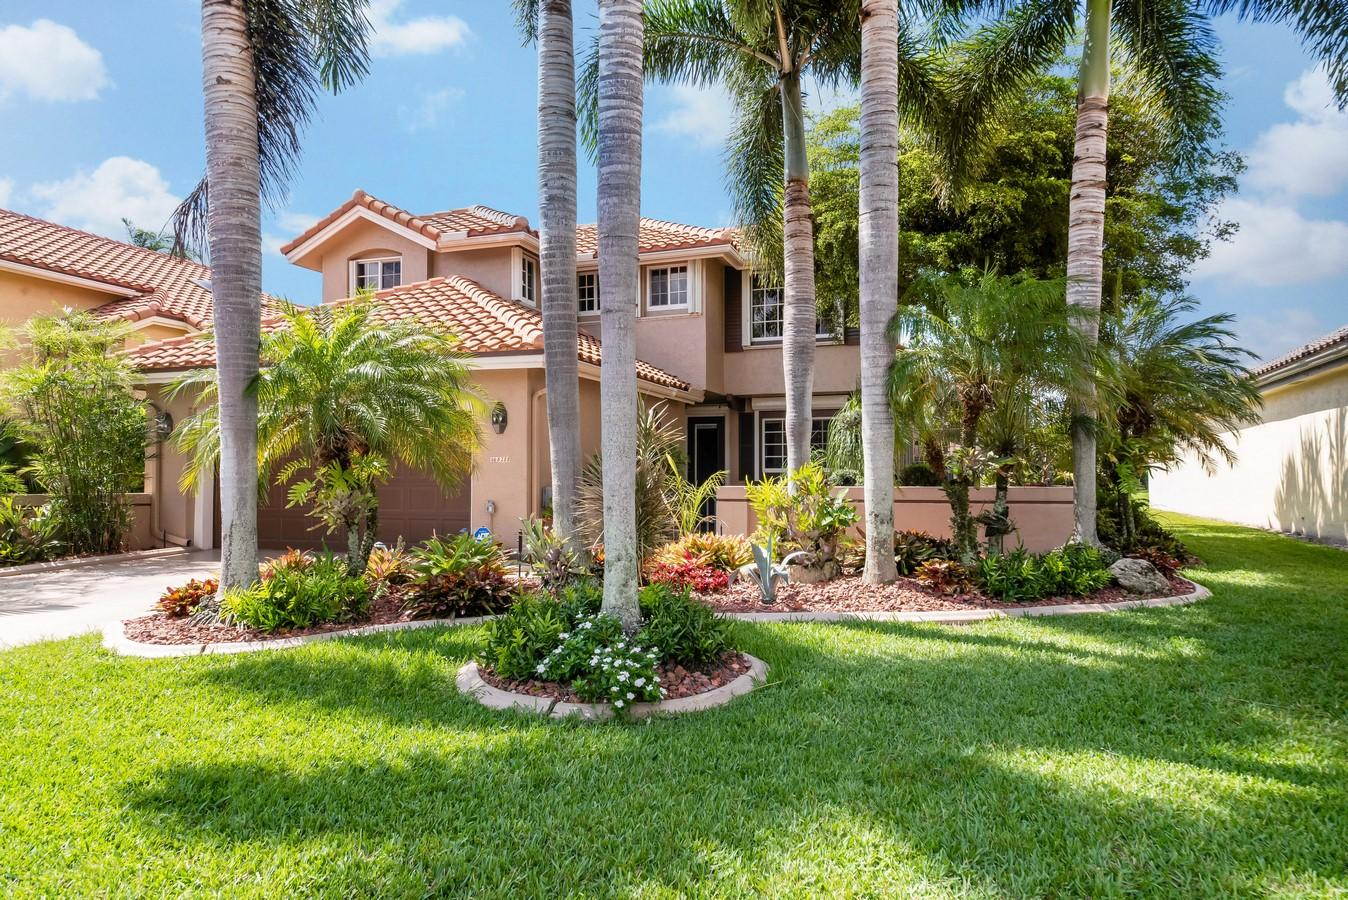 Photo of 6288 NW 24th Street, Boca Raton, FL 33434